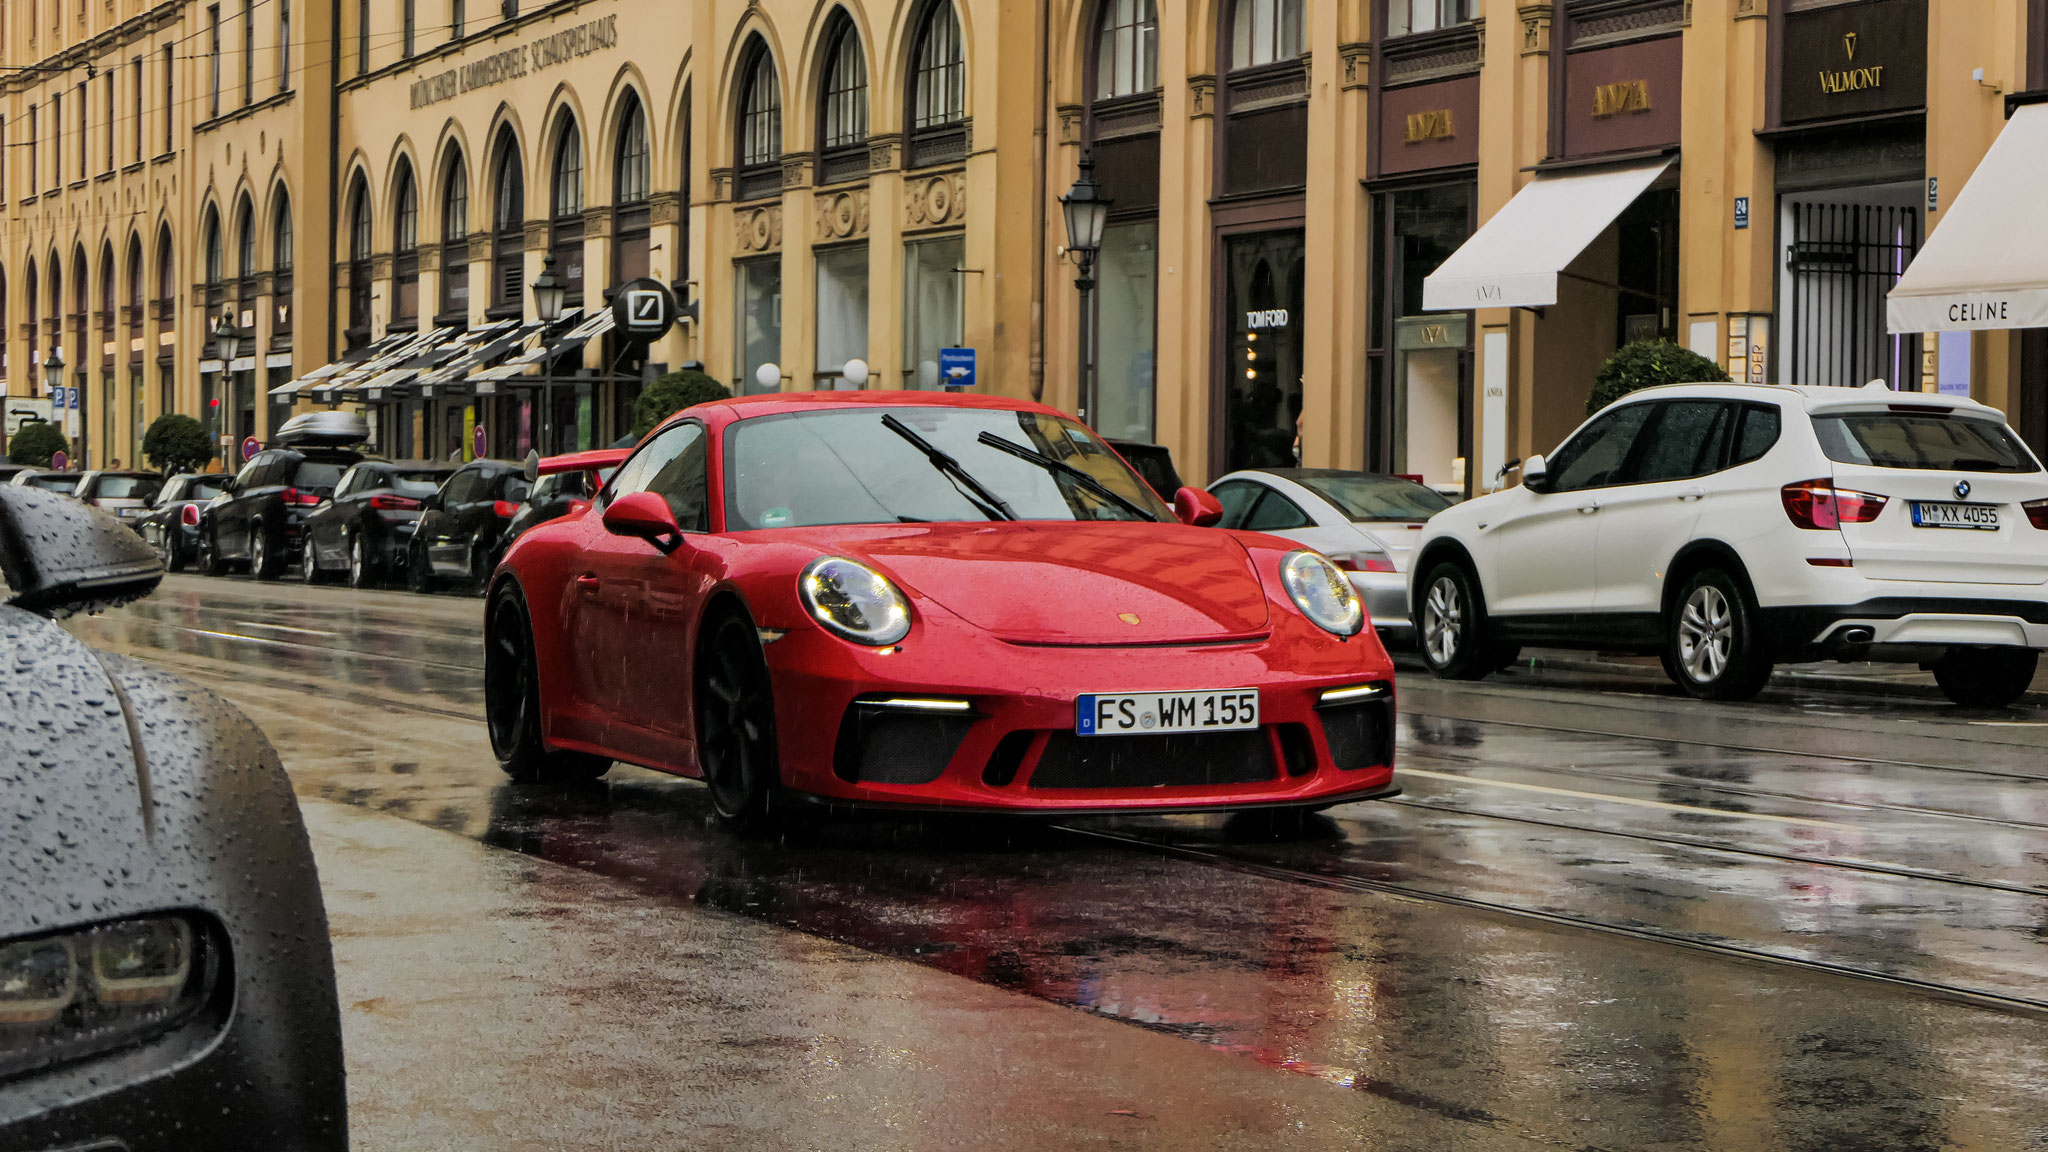 Porsche 991 GT3 - FS-WM-155